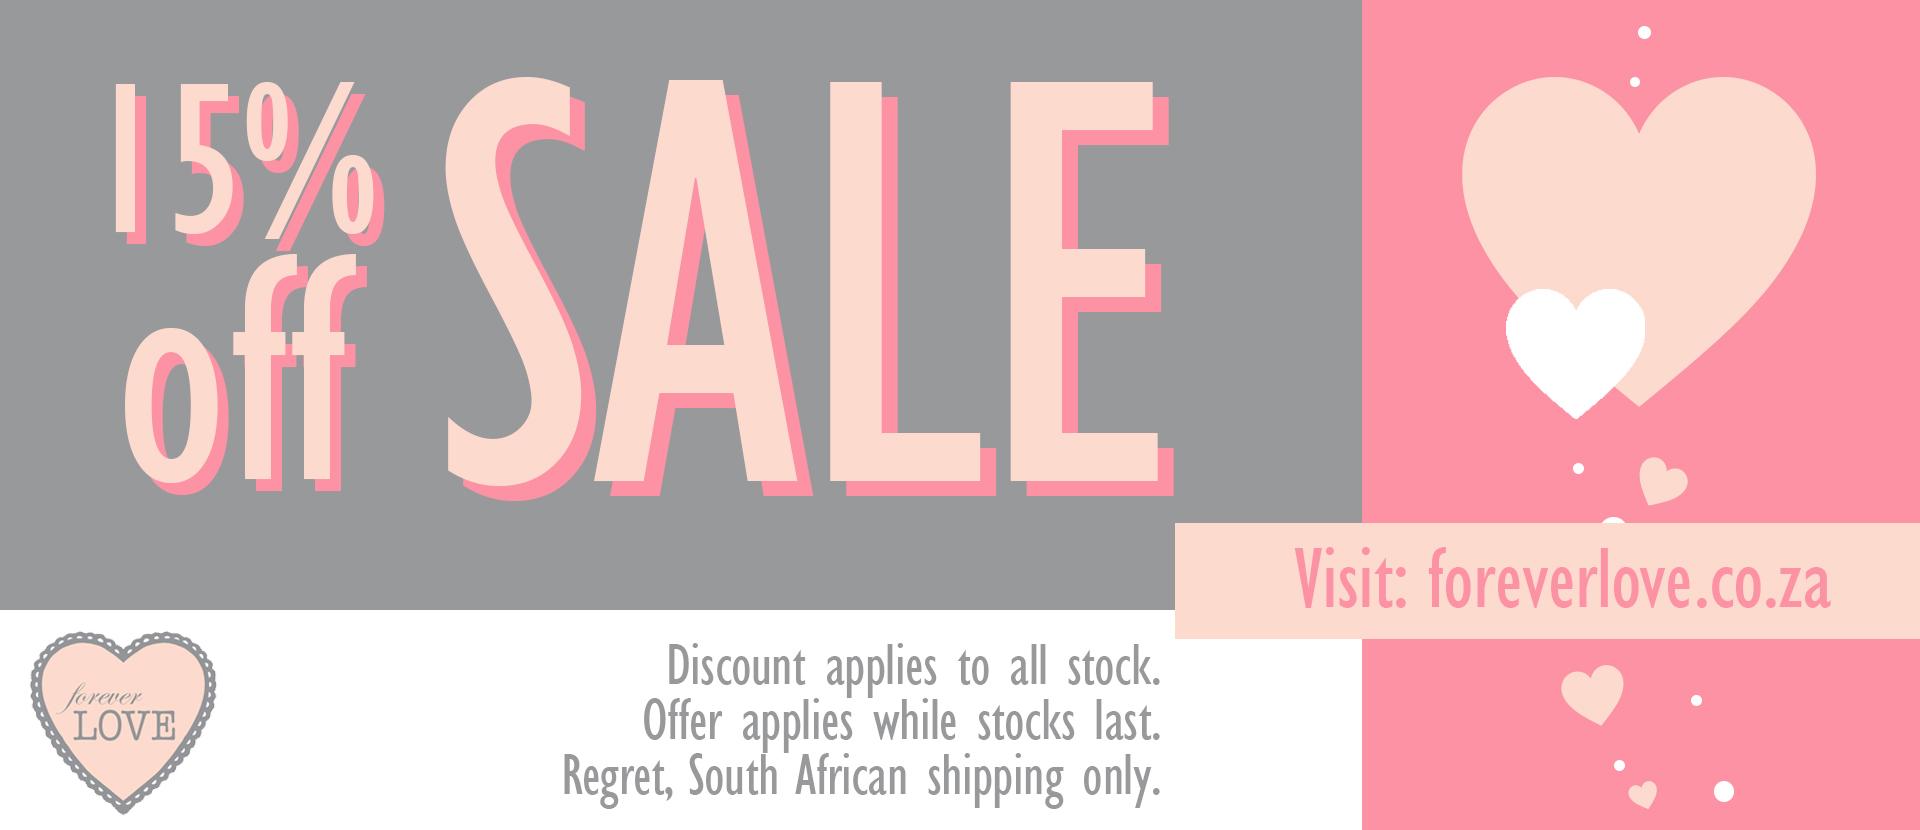 Forever love sale web banner